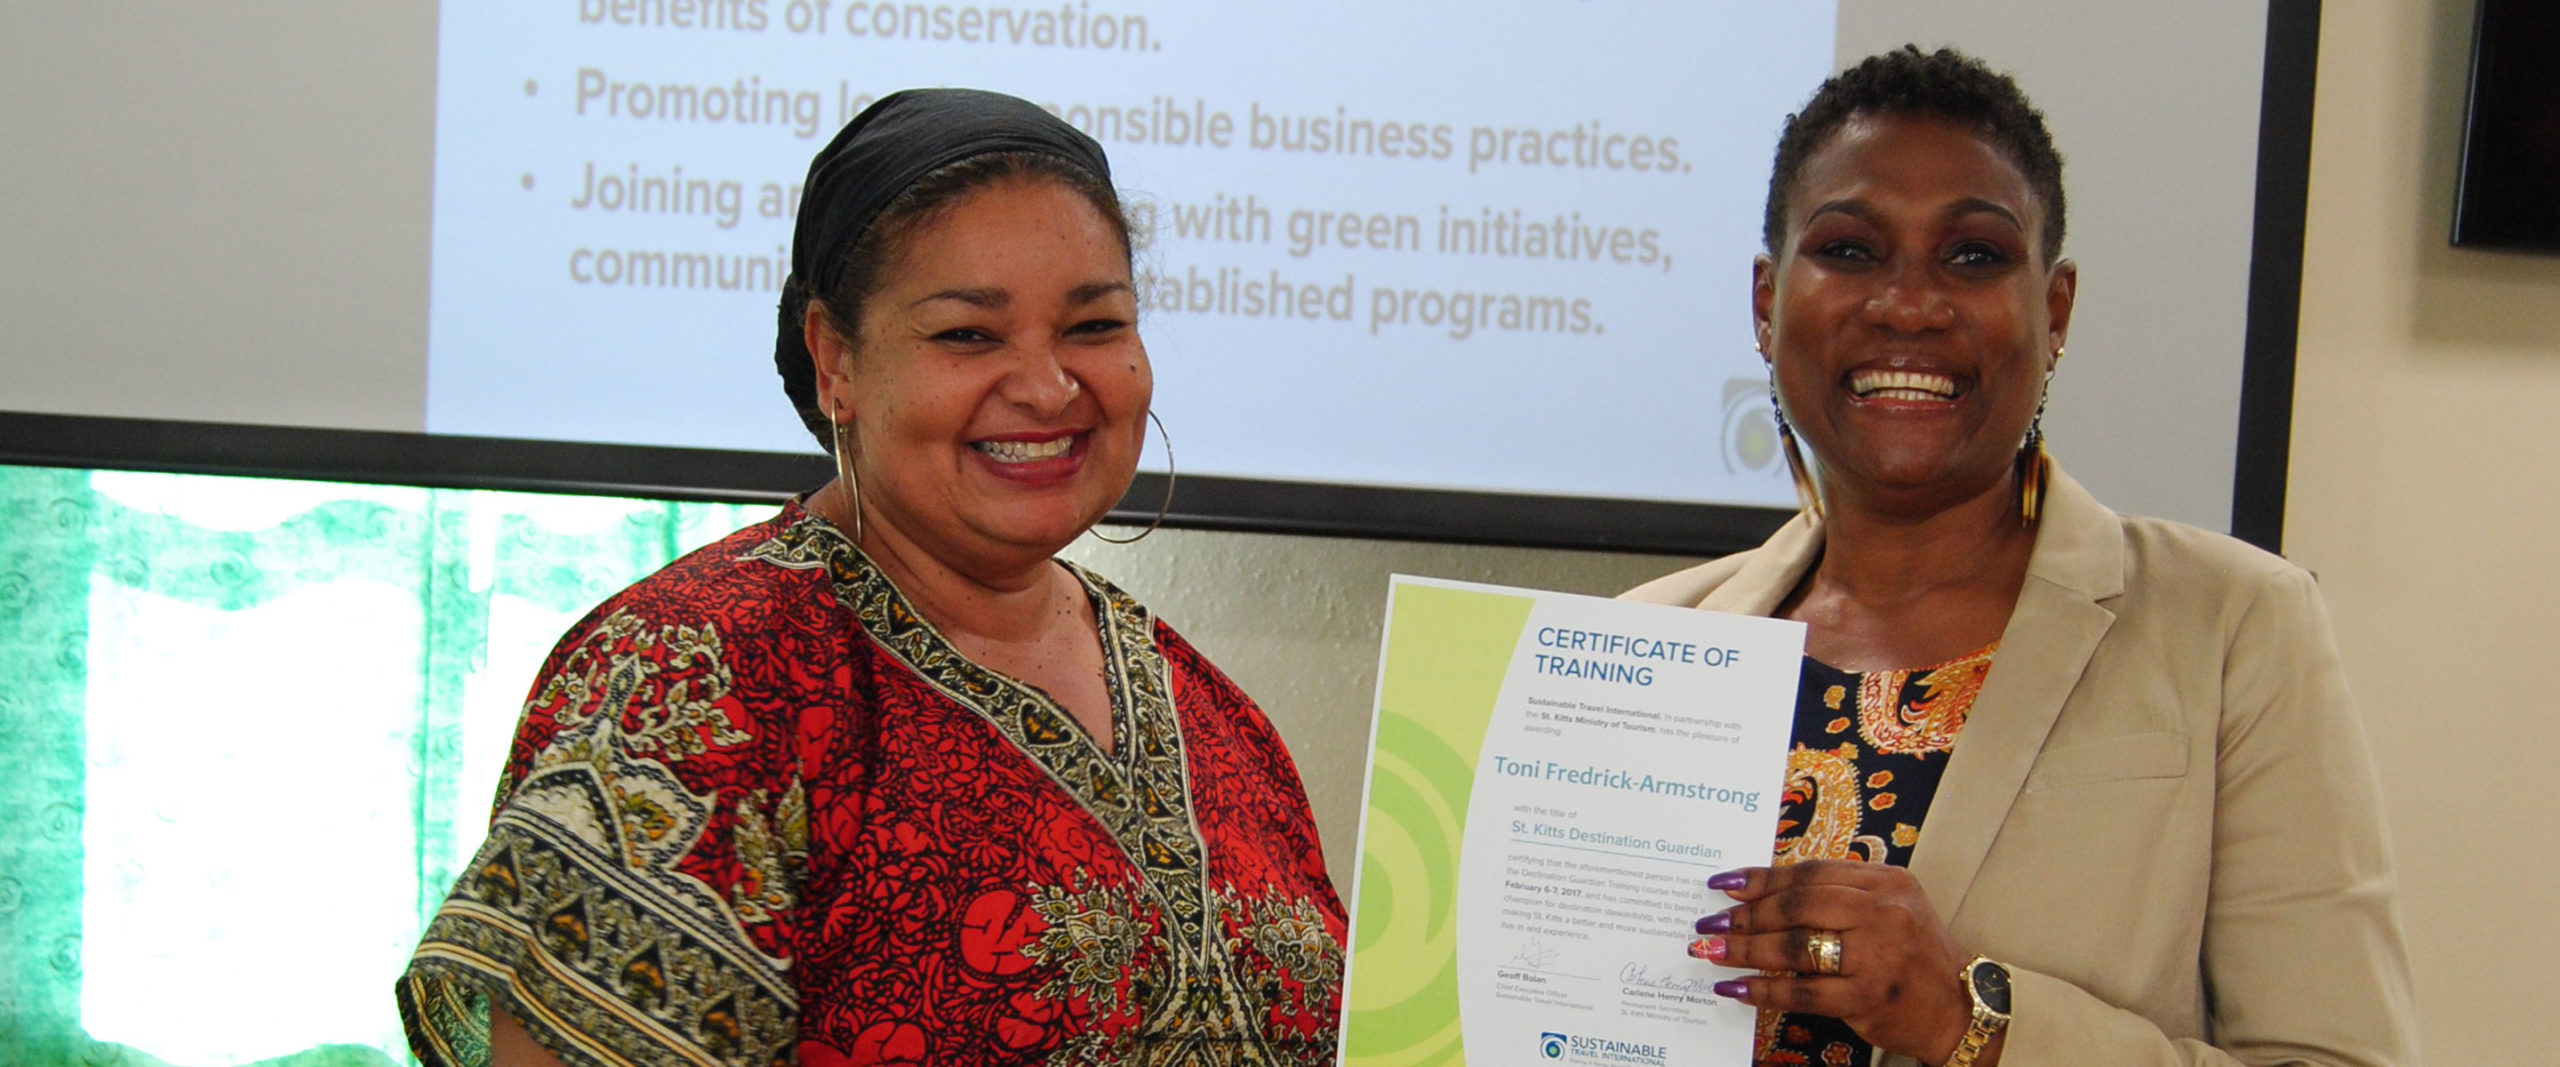 Destination Guardian participant receiving training certificate